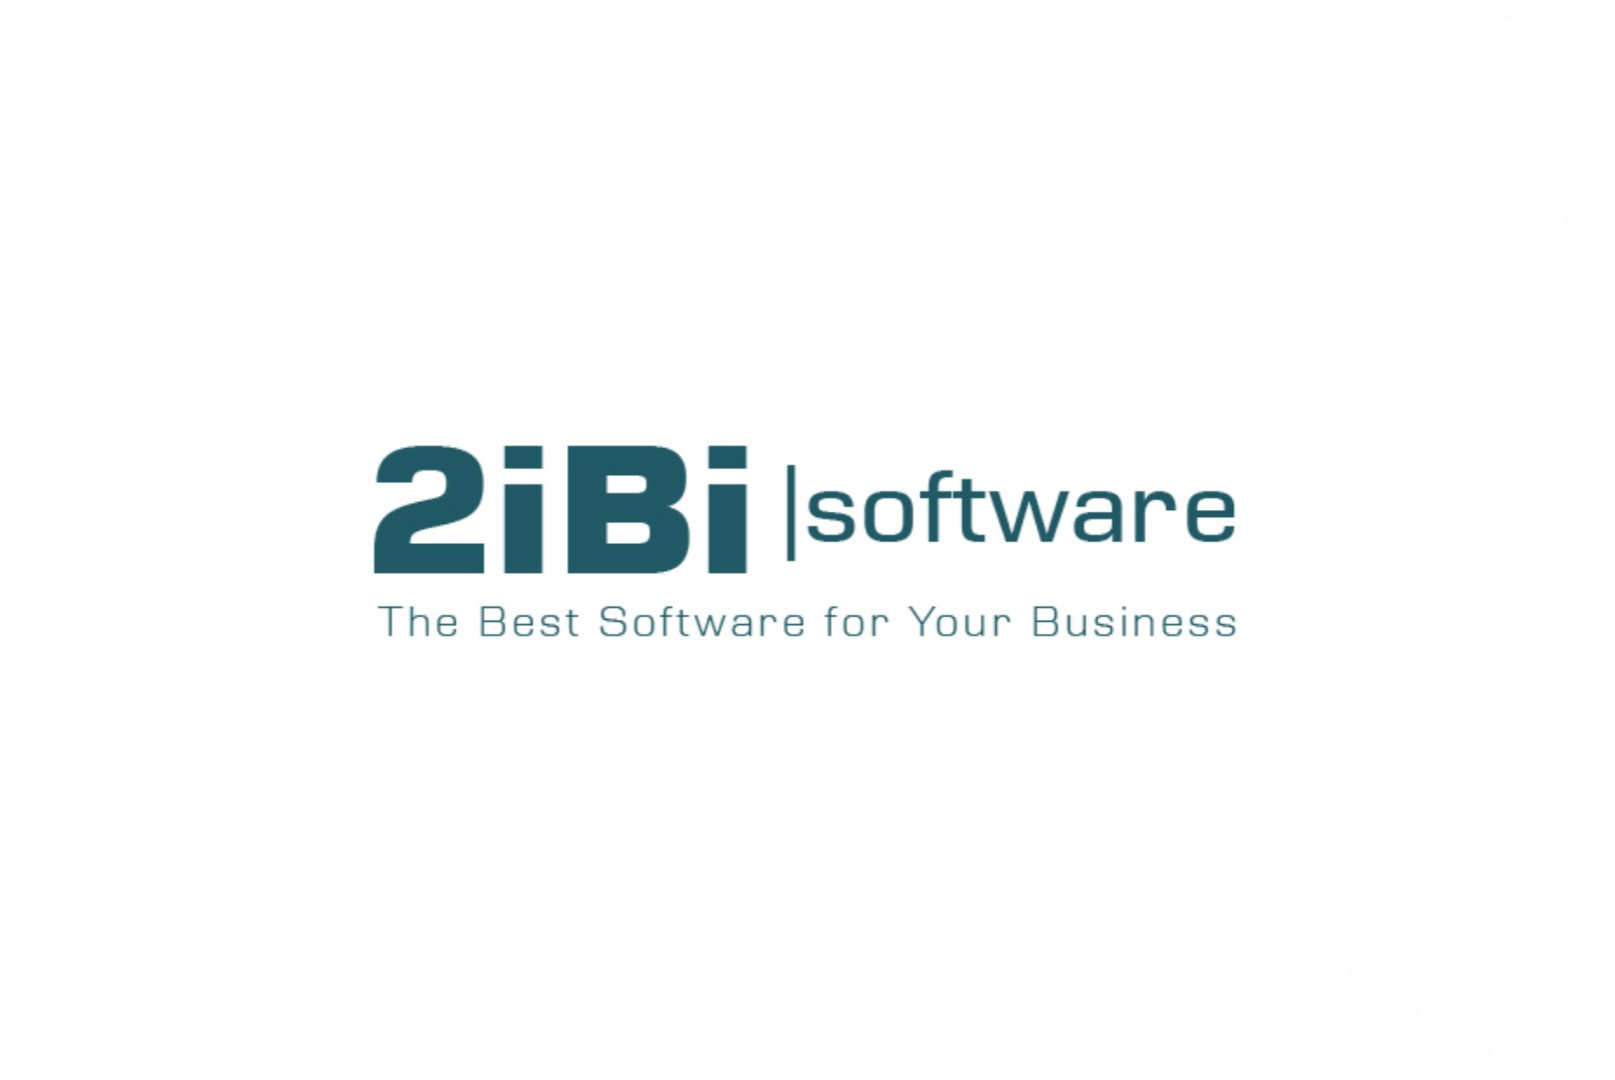 Sovagasmoz - 2iBi software